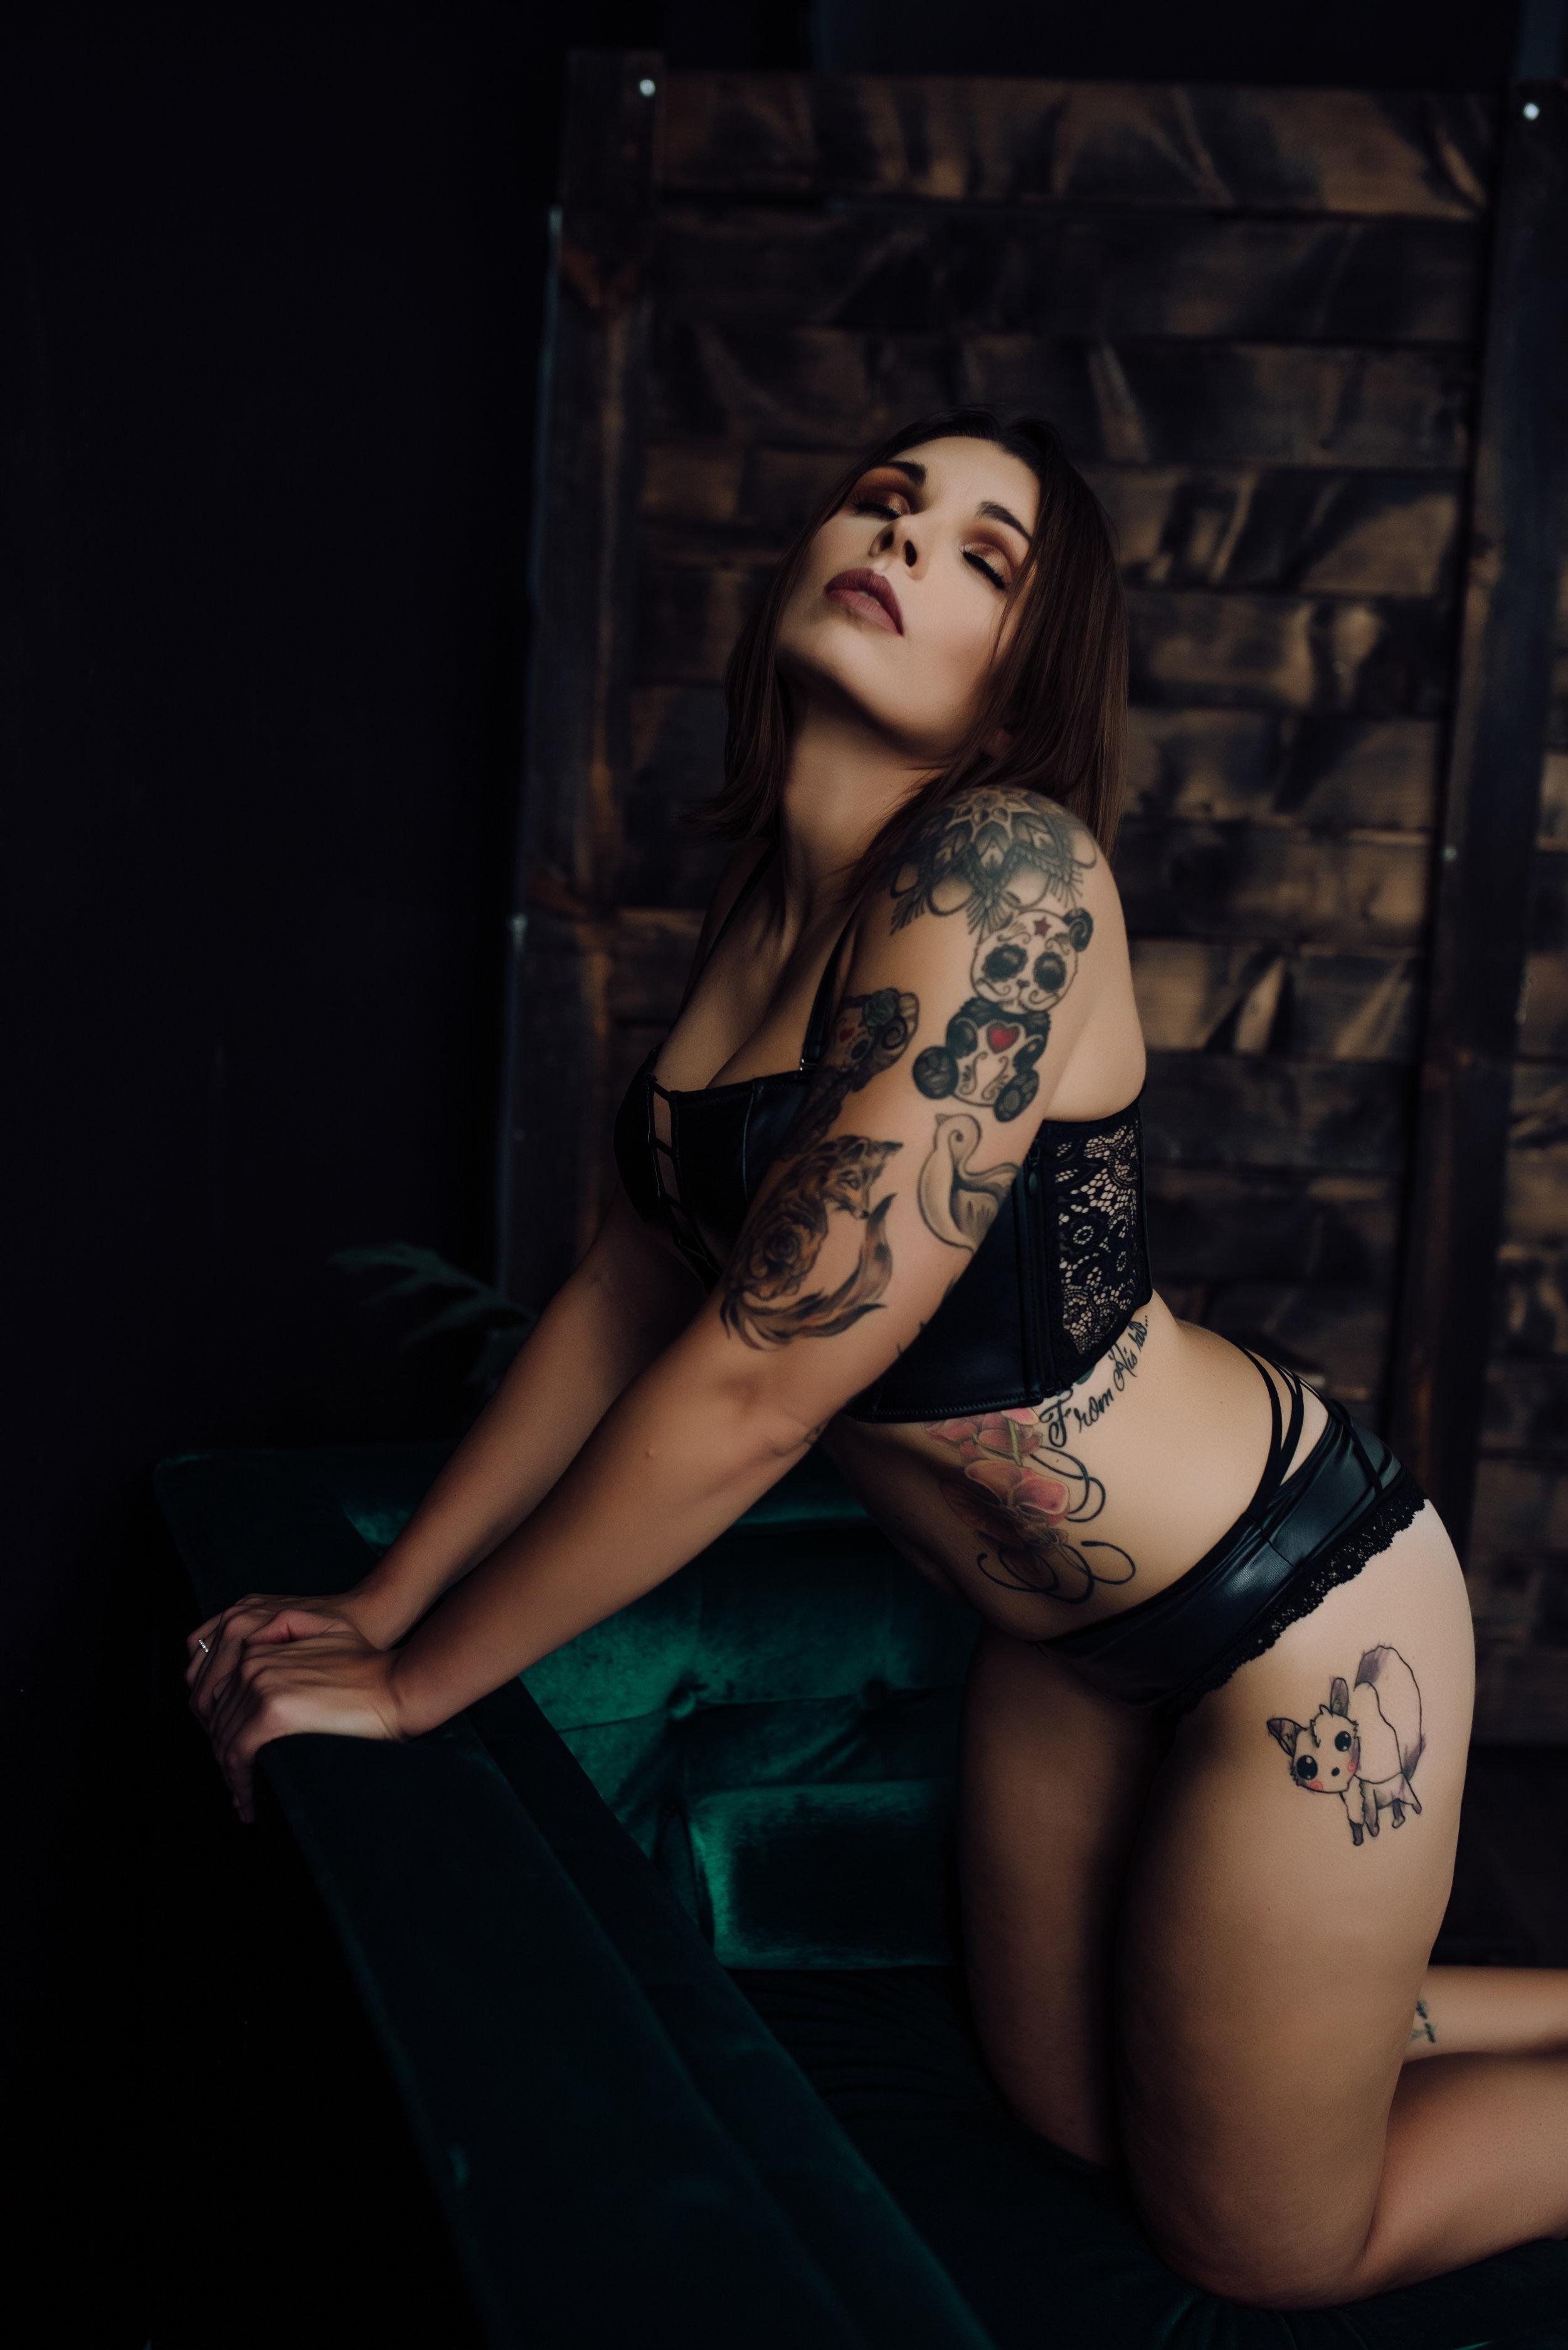 boudoir-photography-best-in-berks-35.jpg